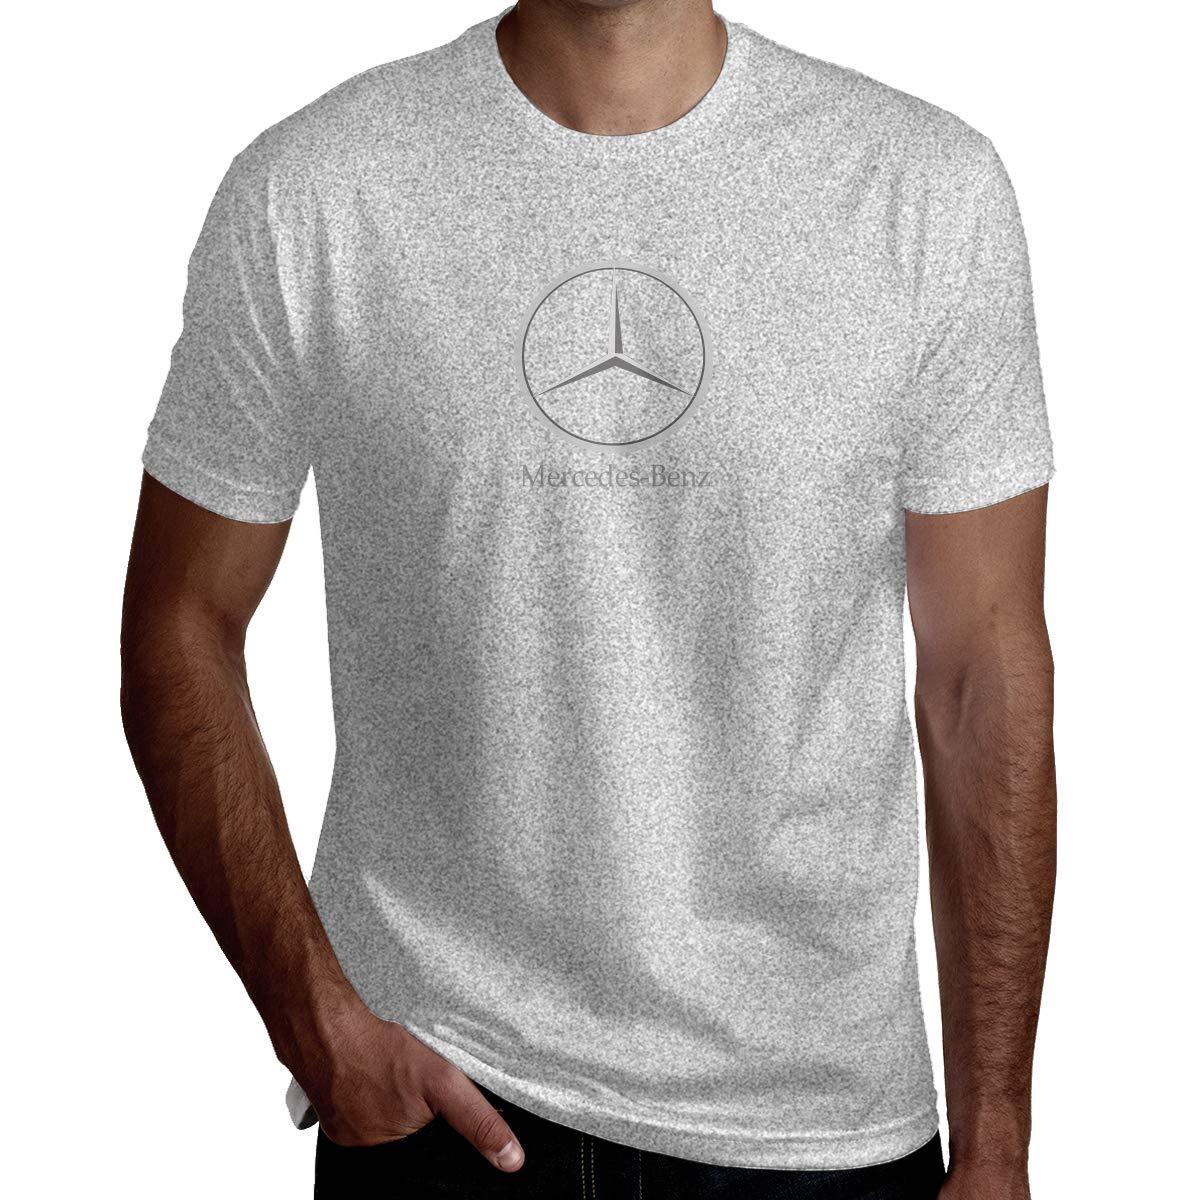 LucyEve Designed T Shirt Mercedes Benz Logo Tshirts Short Sleeve for Man Gray XL